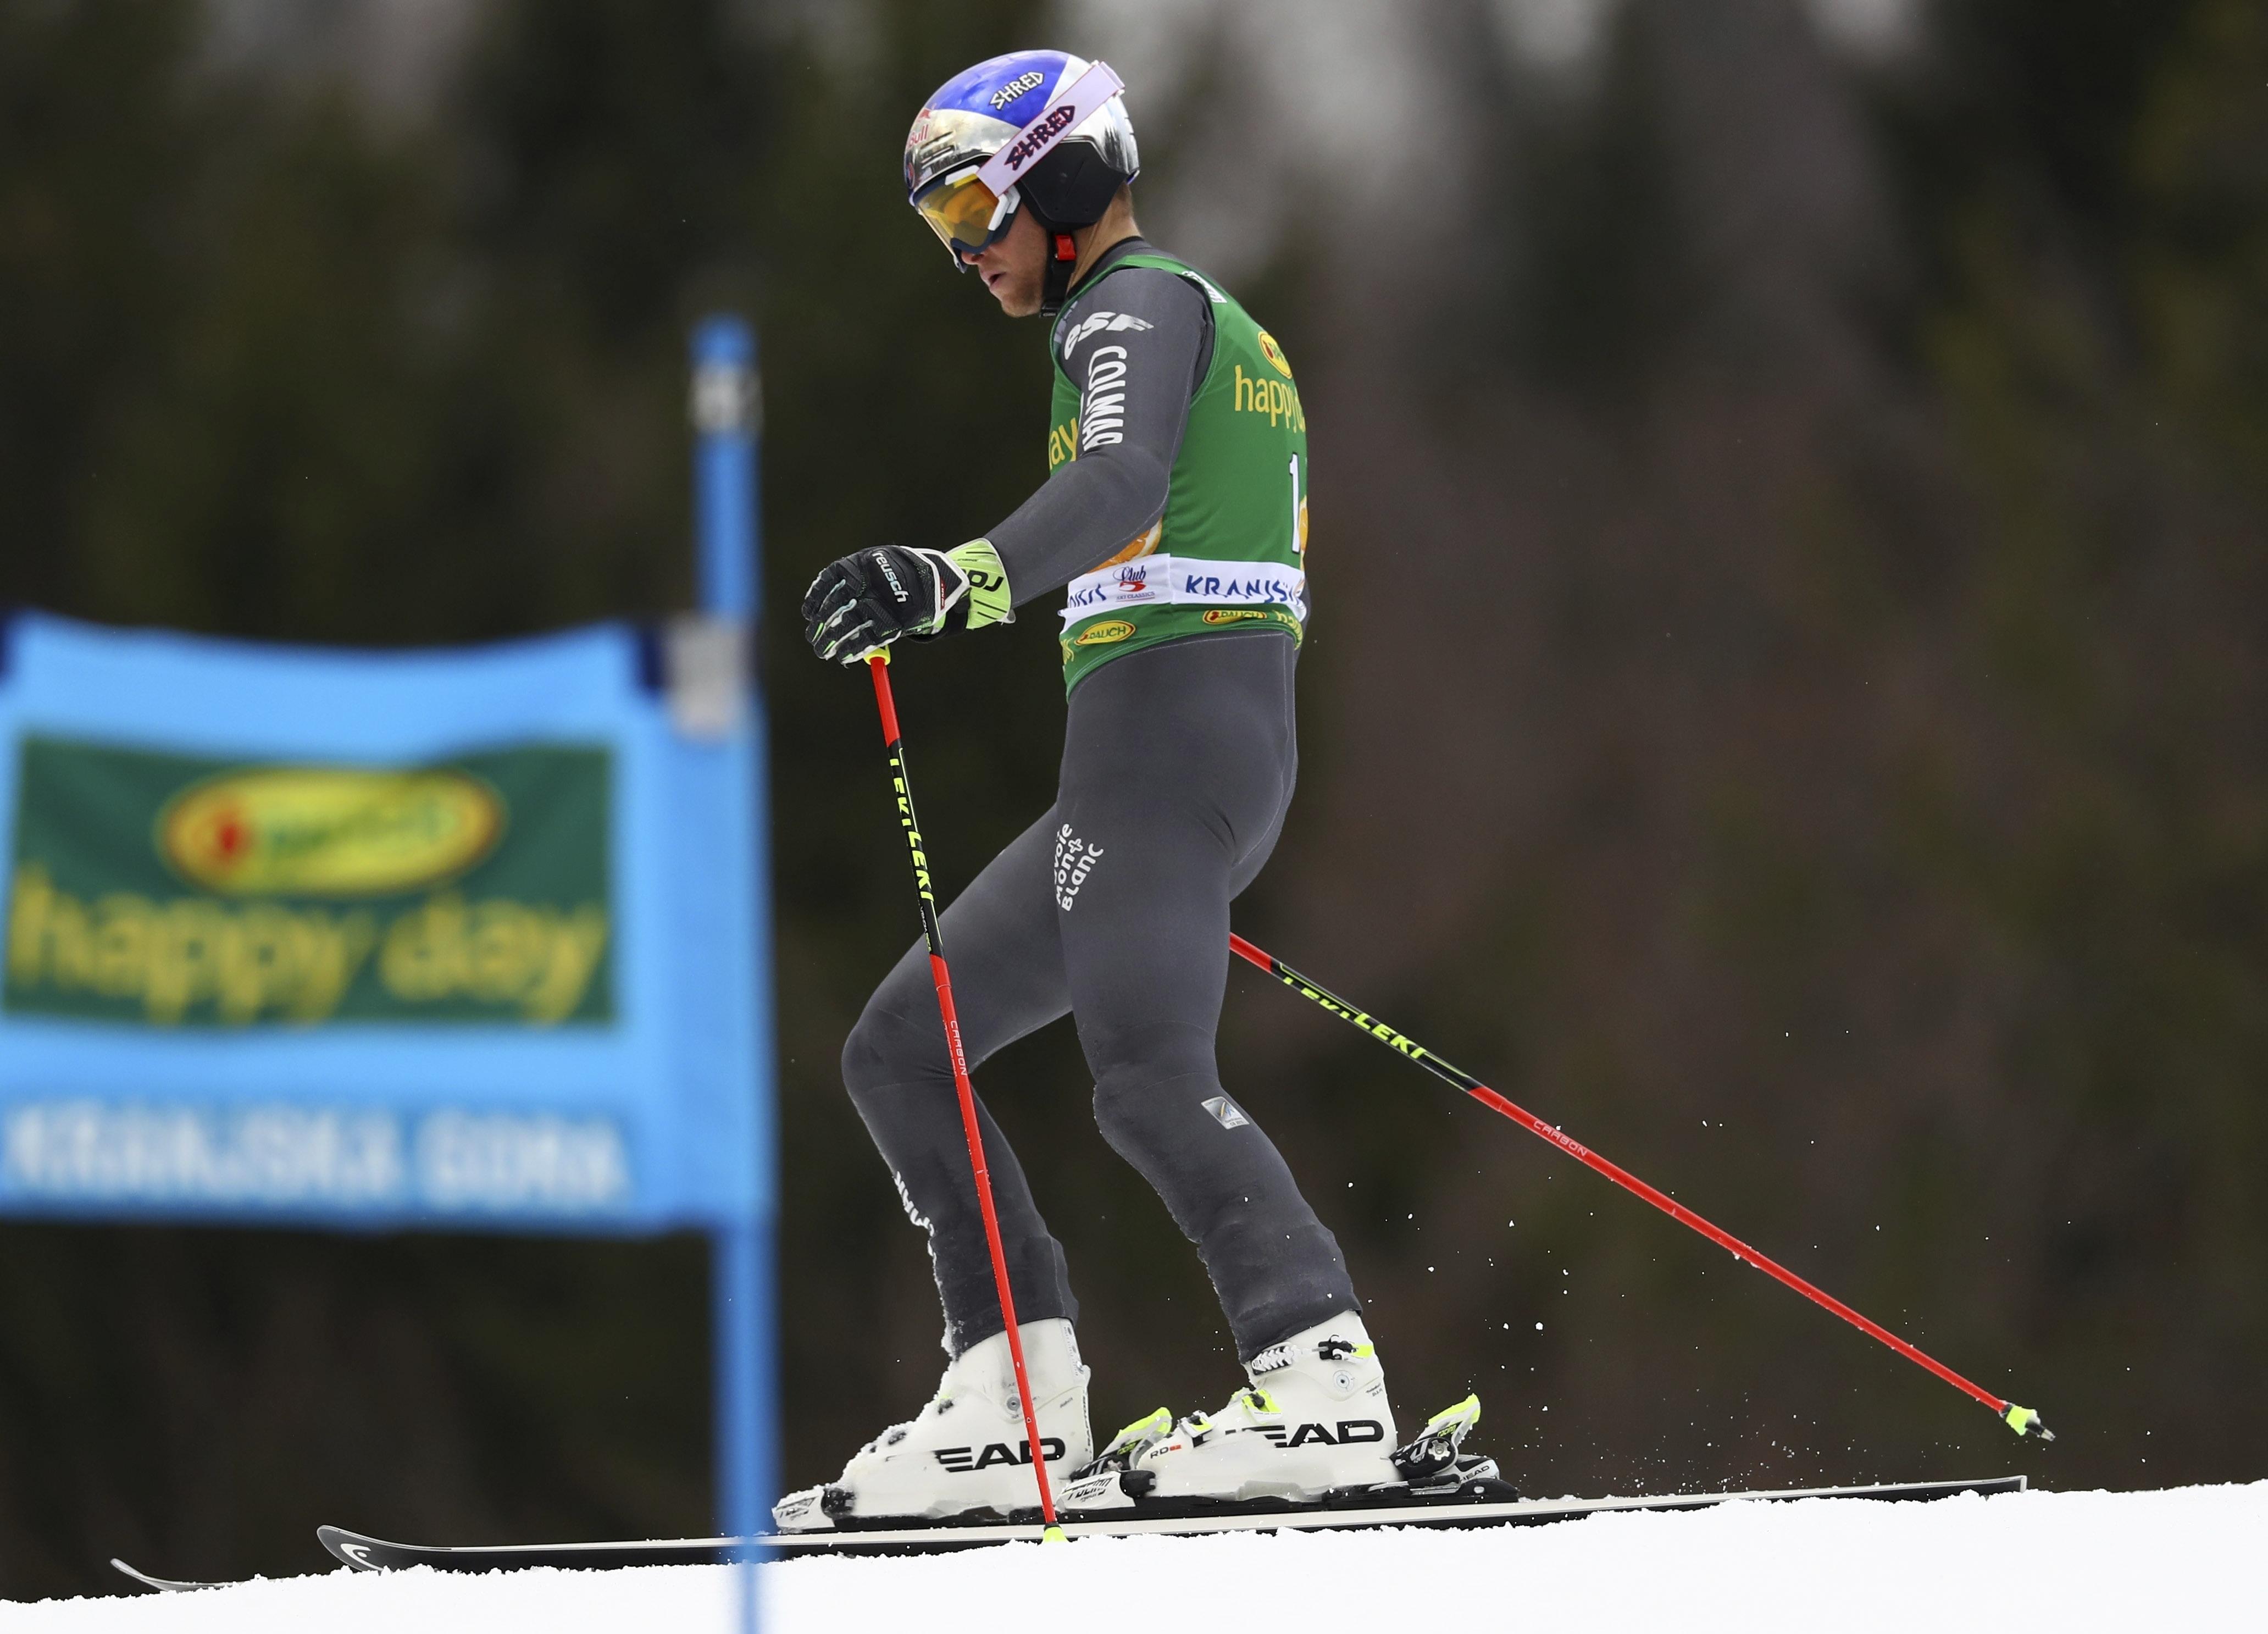 France's Alexis Pinturault fails to complete an alpine ski, men's World Cup giant slalom, in Kranjska Gora, Slovenia, Saturday, March 4, 2017. (AP Photo/Alessandro Trovati)